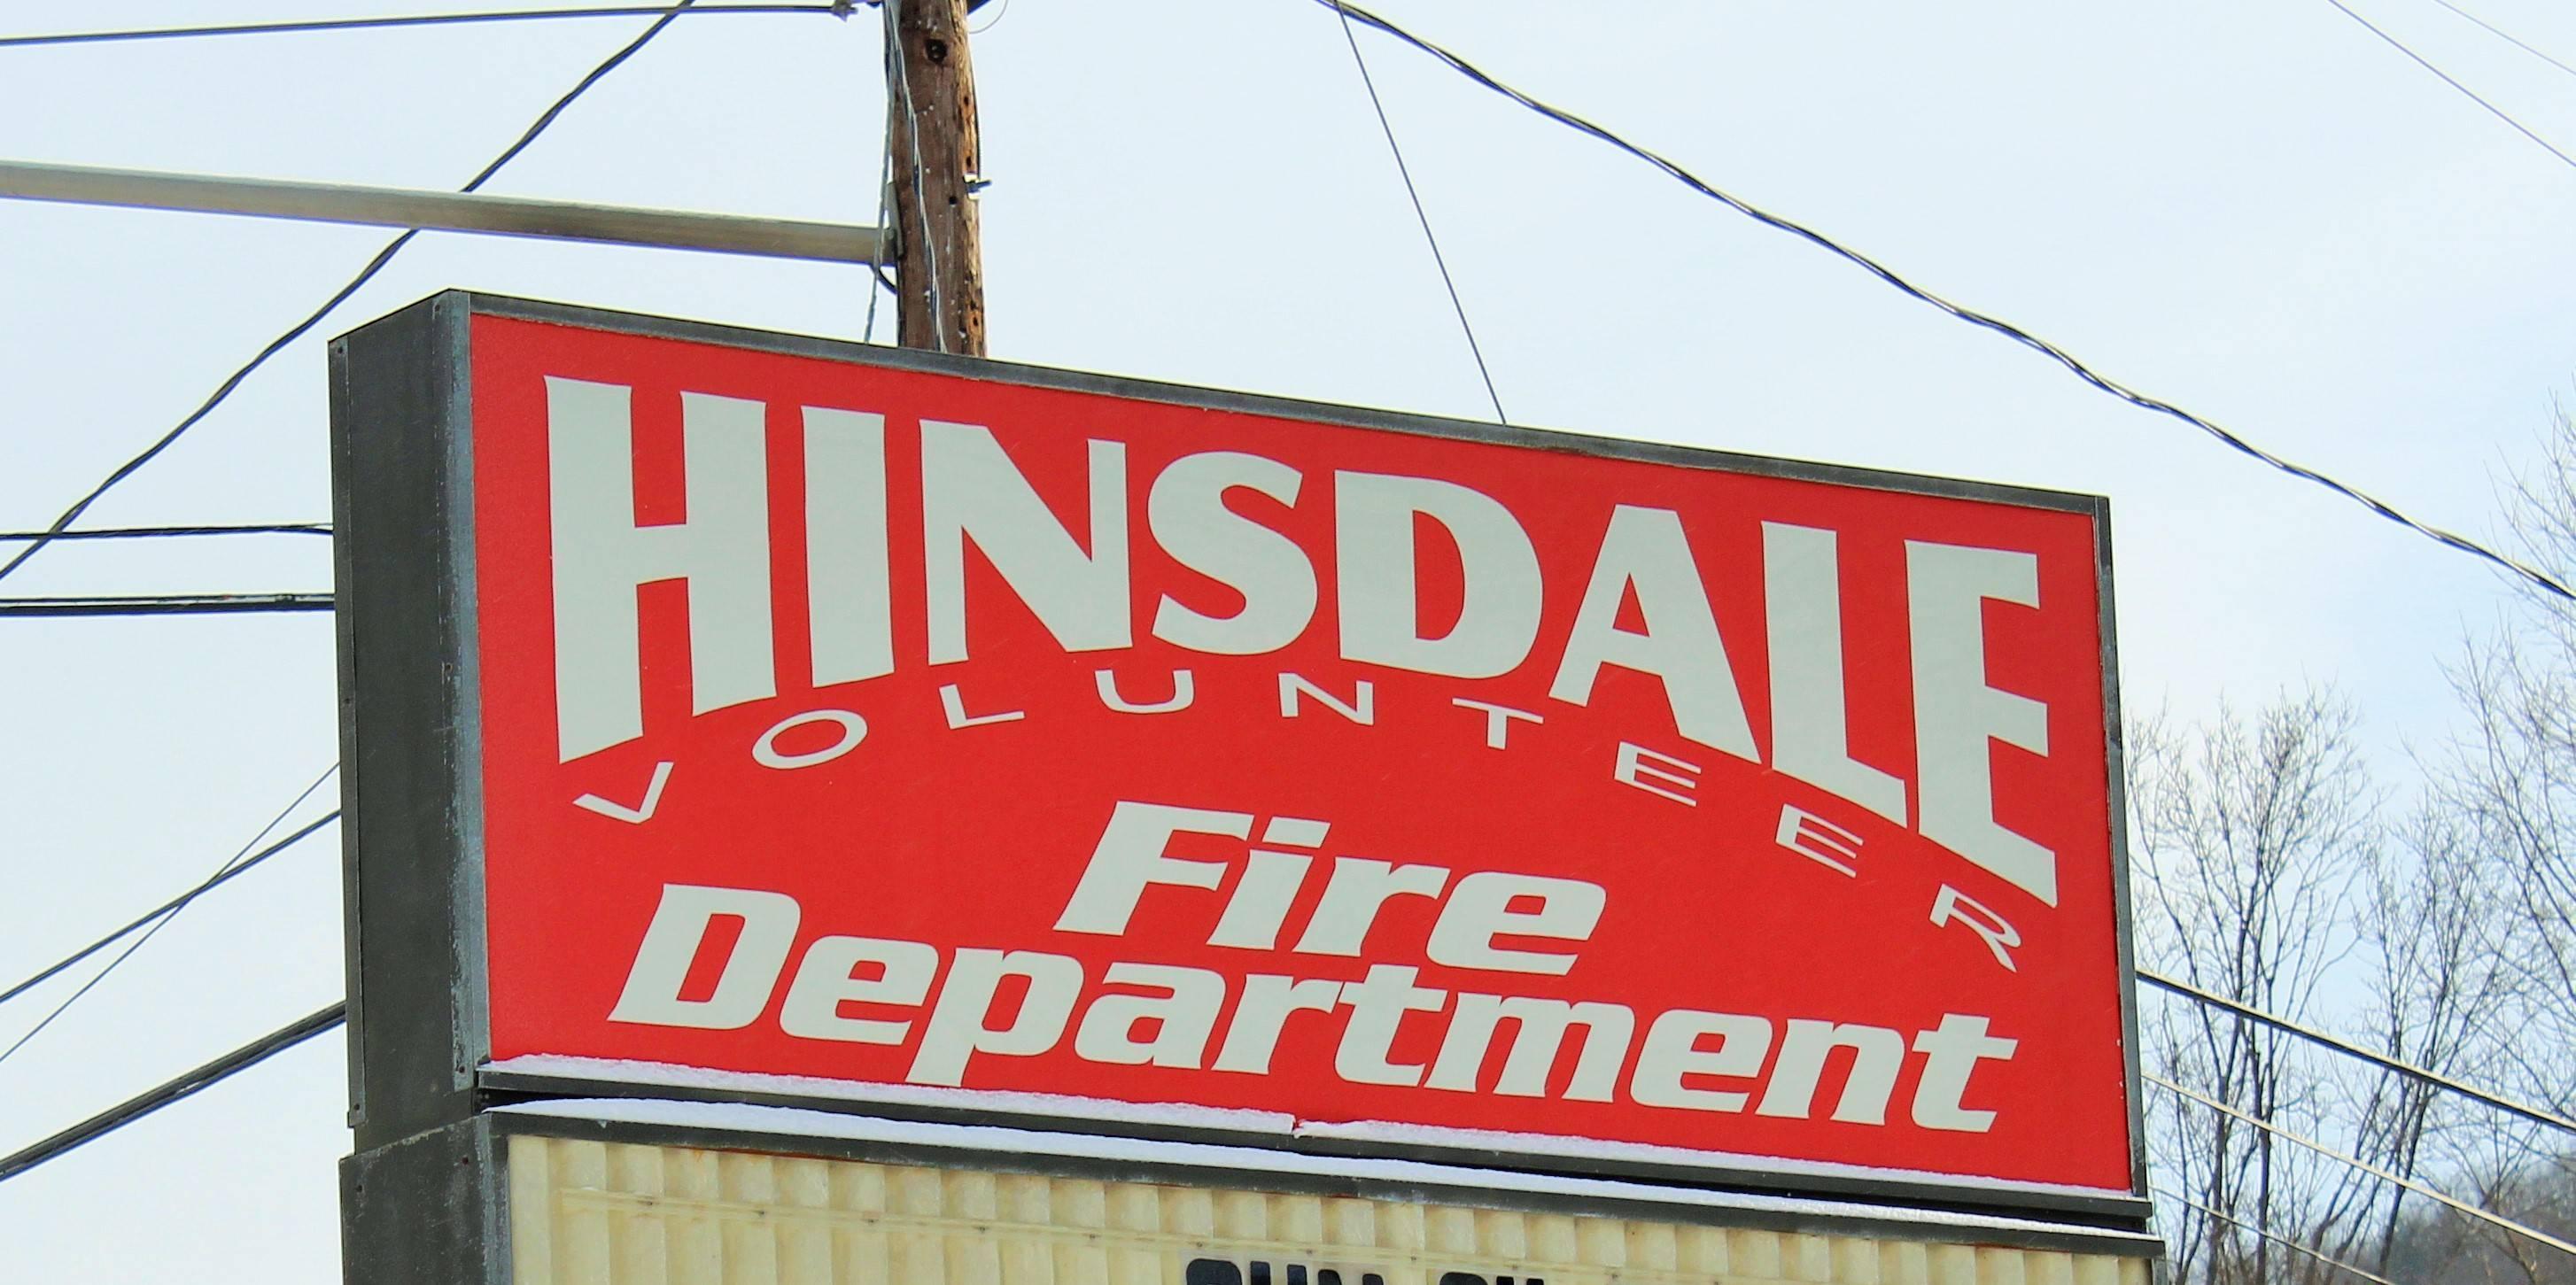 48bc0d9297ae16e71701_17c0f3bc87828b783e78_Hinsdale_fire_dept_sign__close_up___2_.JPG